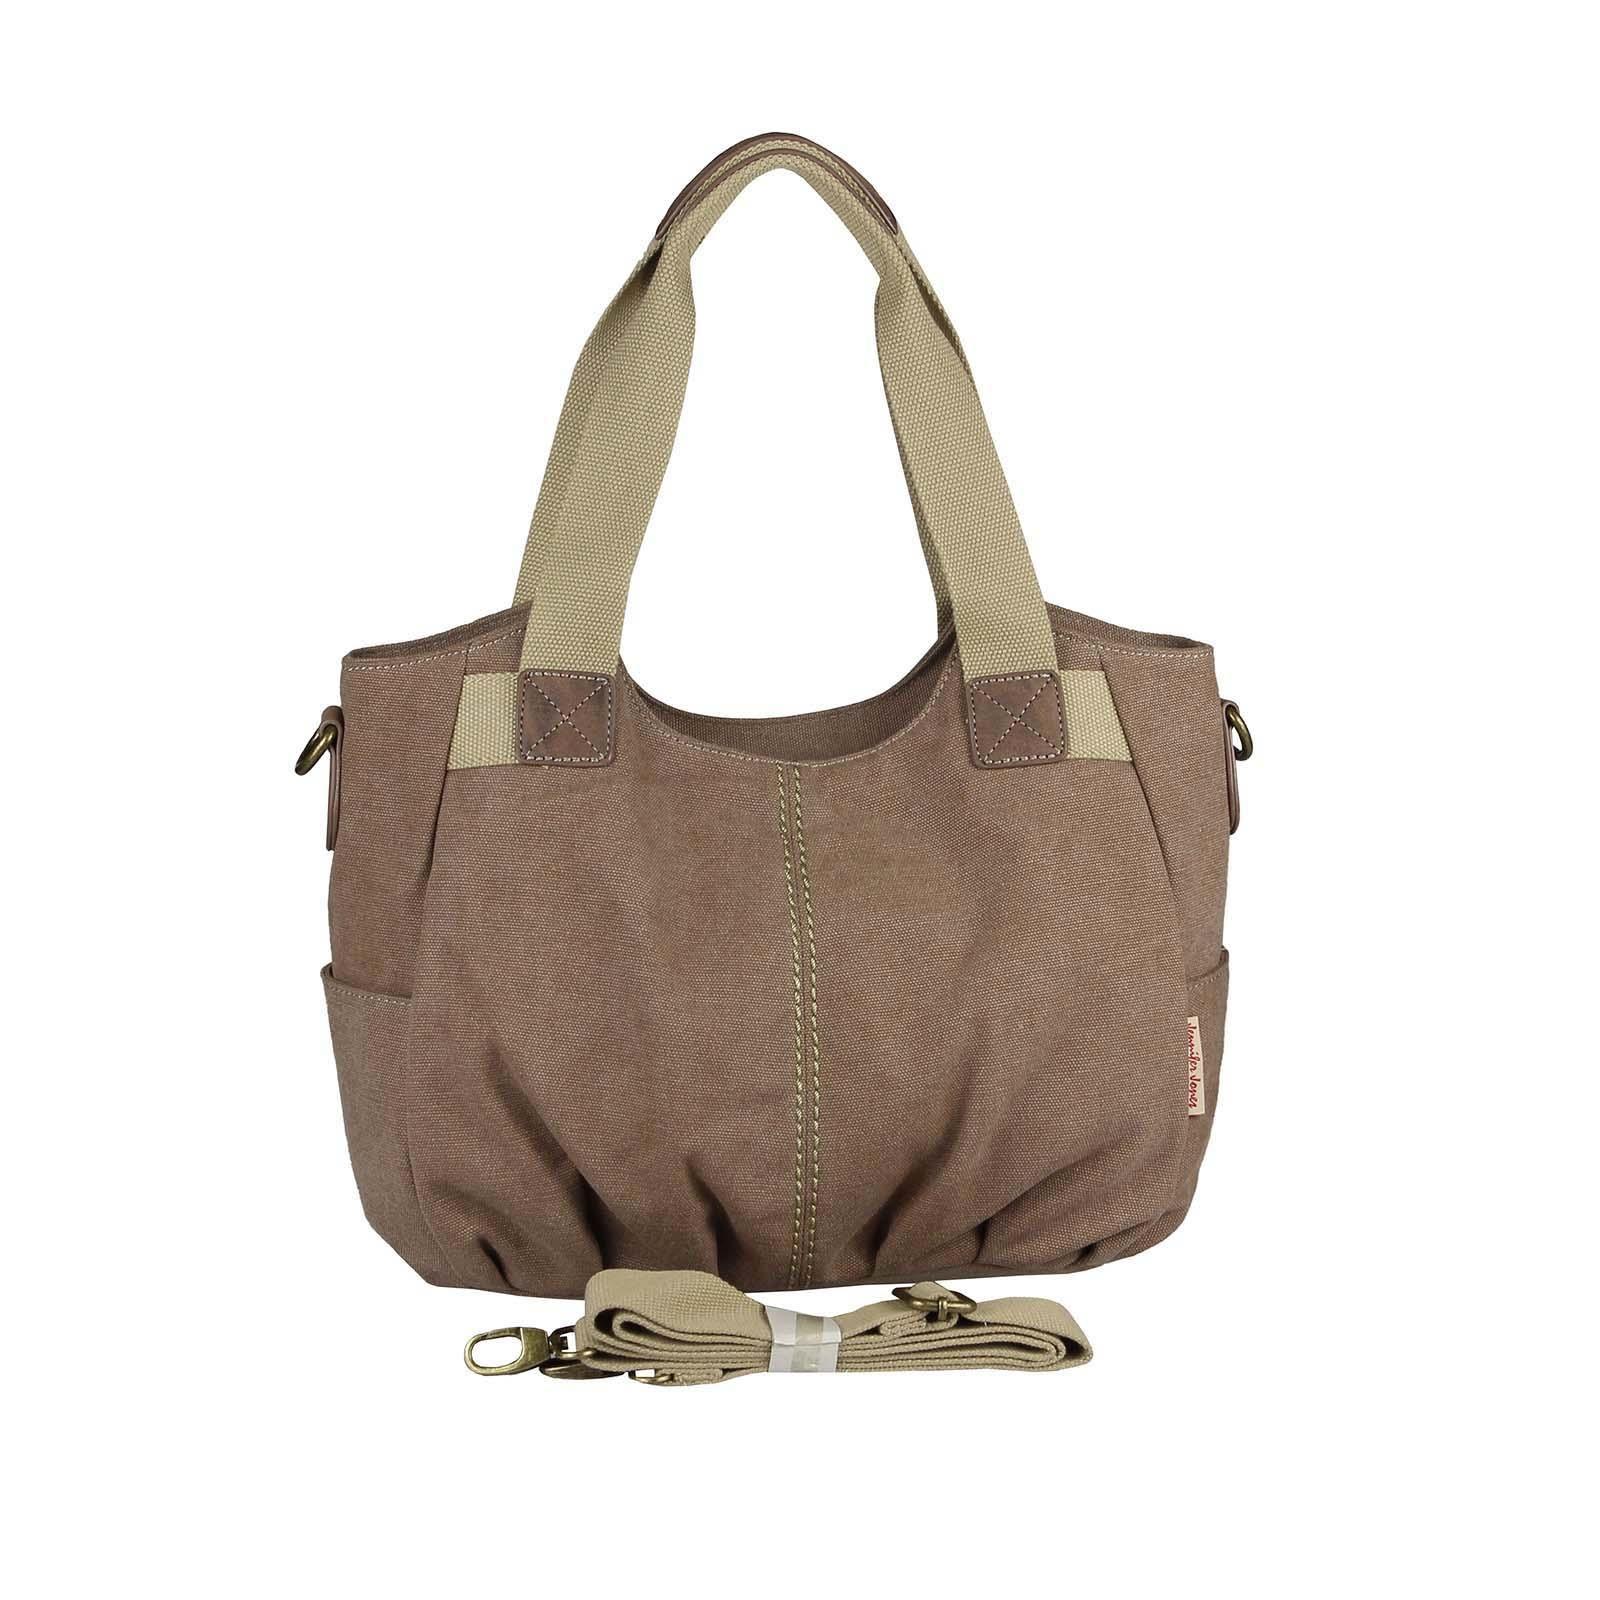 OBC Damen Canvas Tasche Handtasche Henkeltasche Schultertasche Shopper  Umhängetasche CrossOver Stofftasche City Bag Street Beuteltasche 5f402e6a23